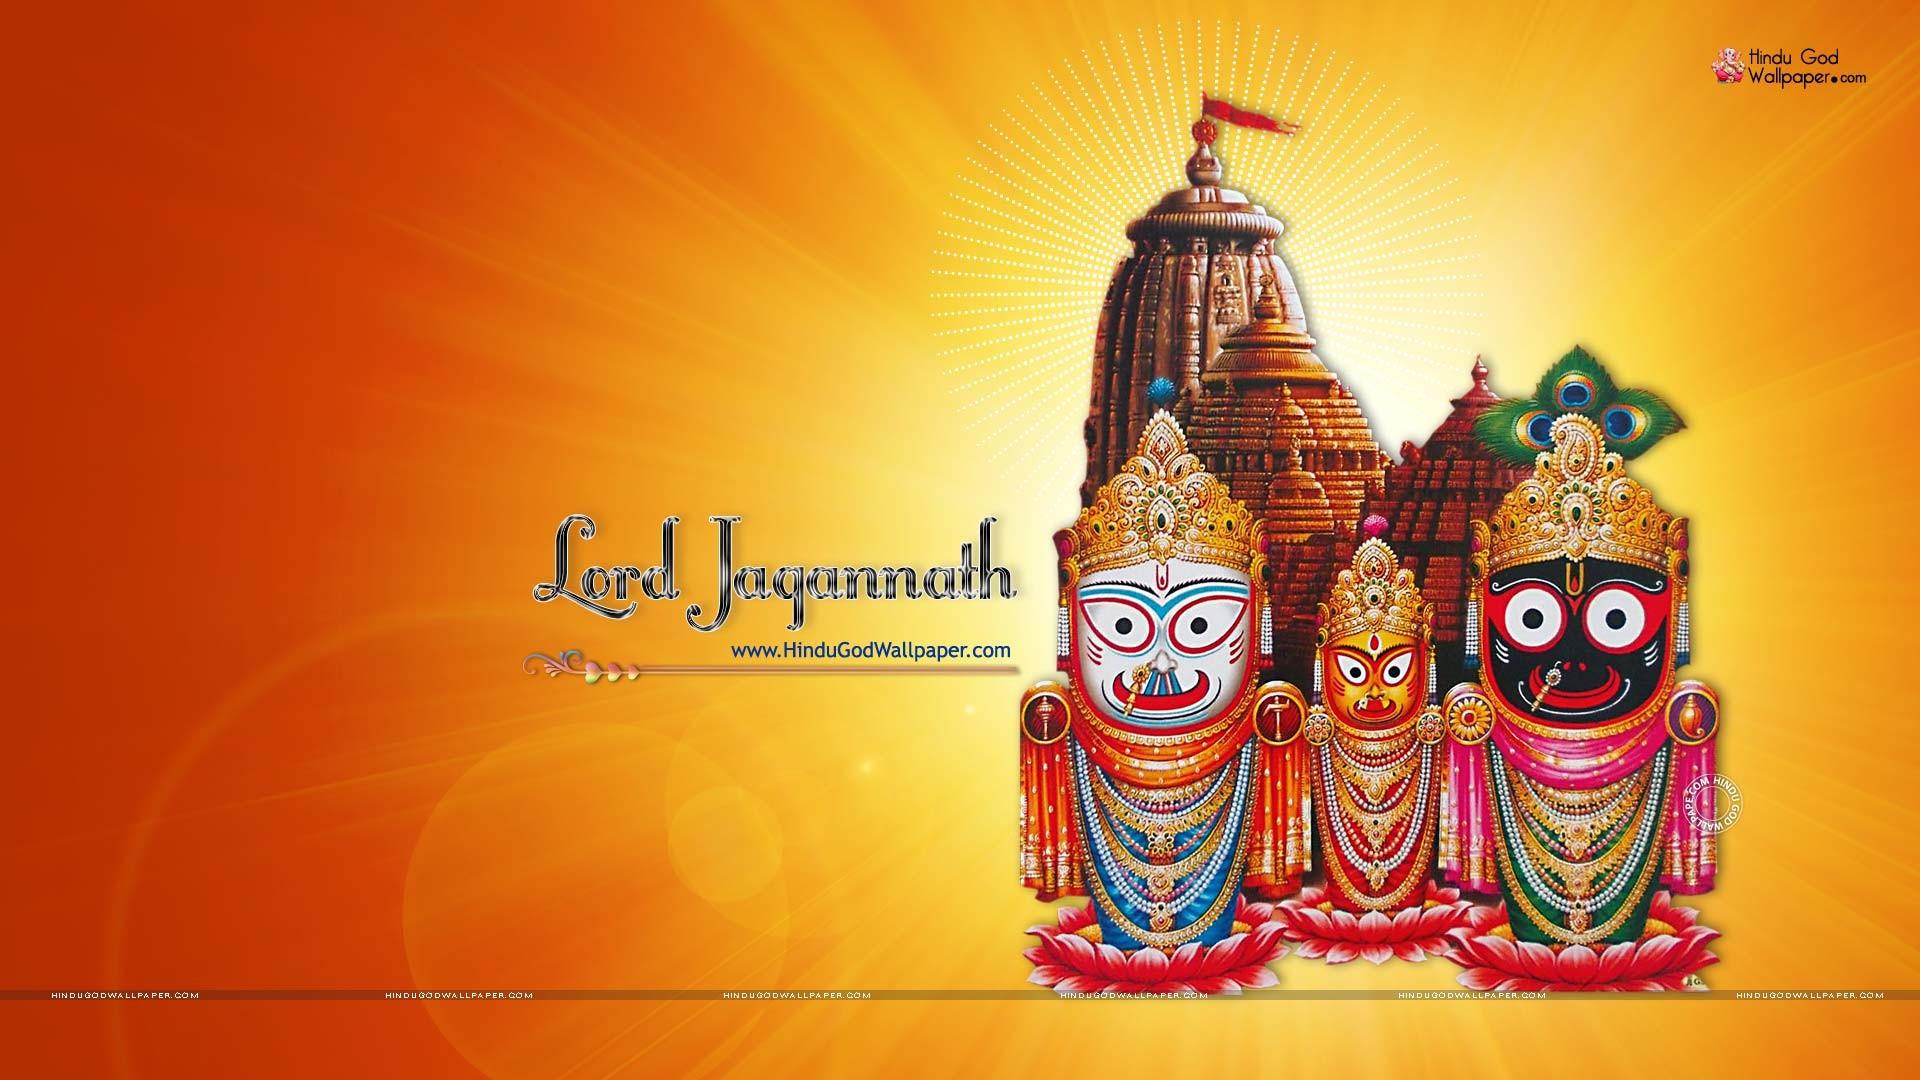 Hindu Gods Wallpaper For Desktop